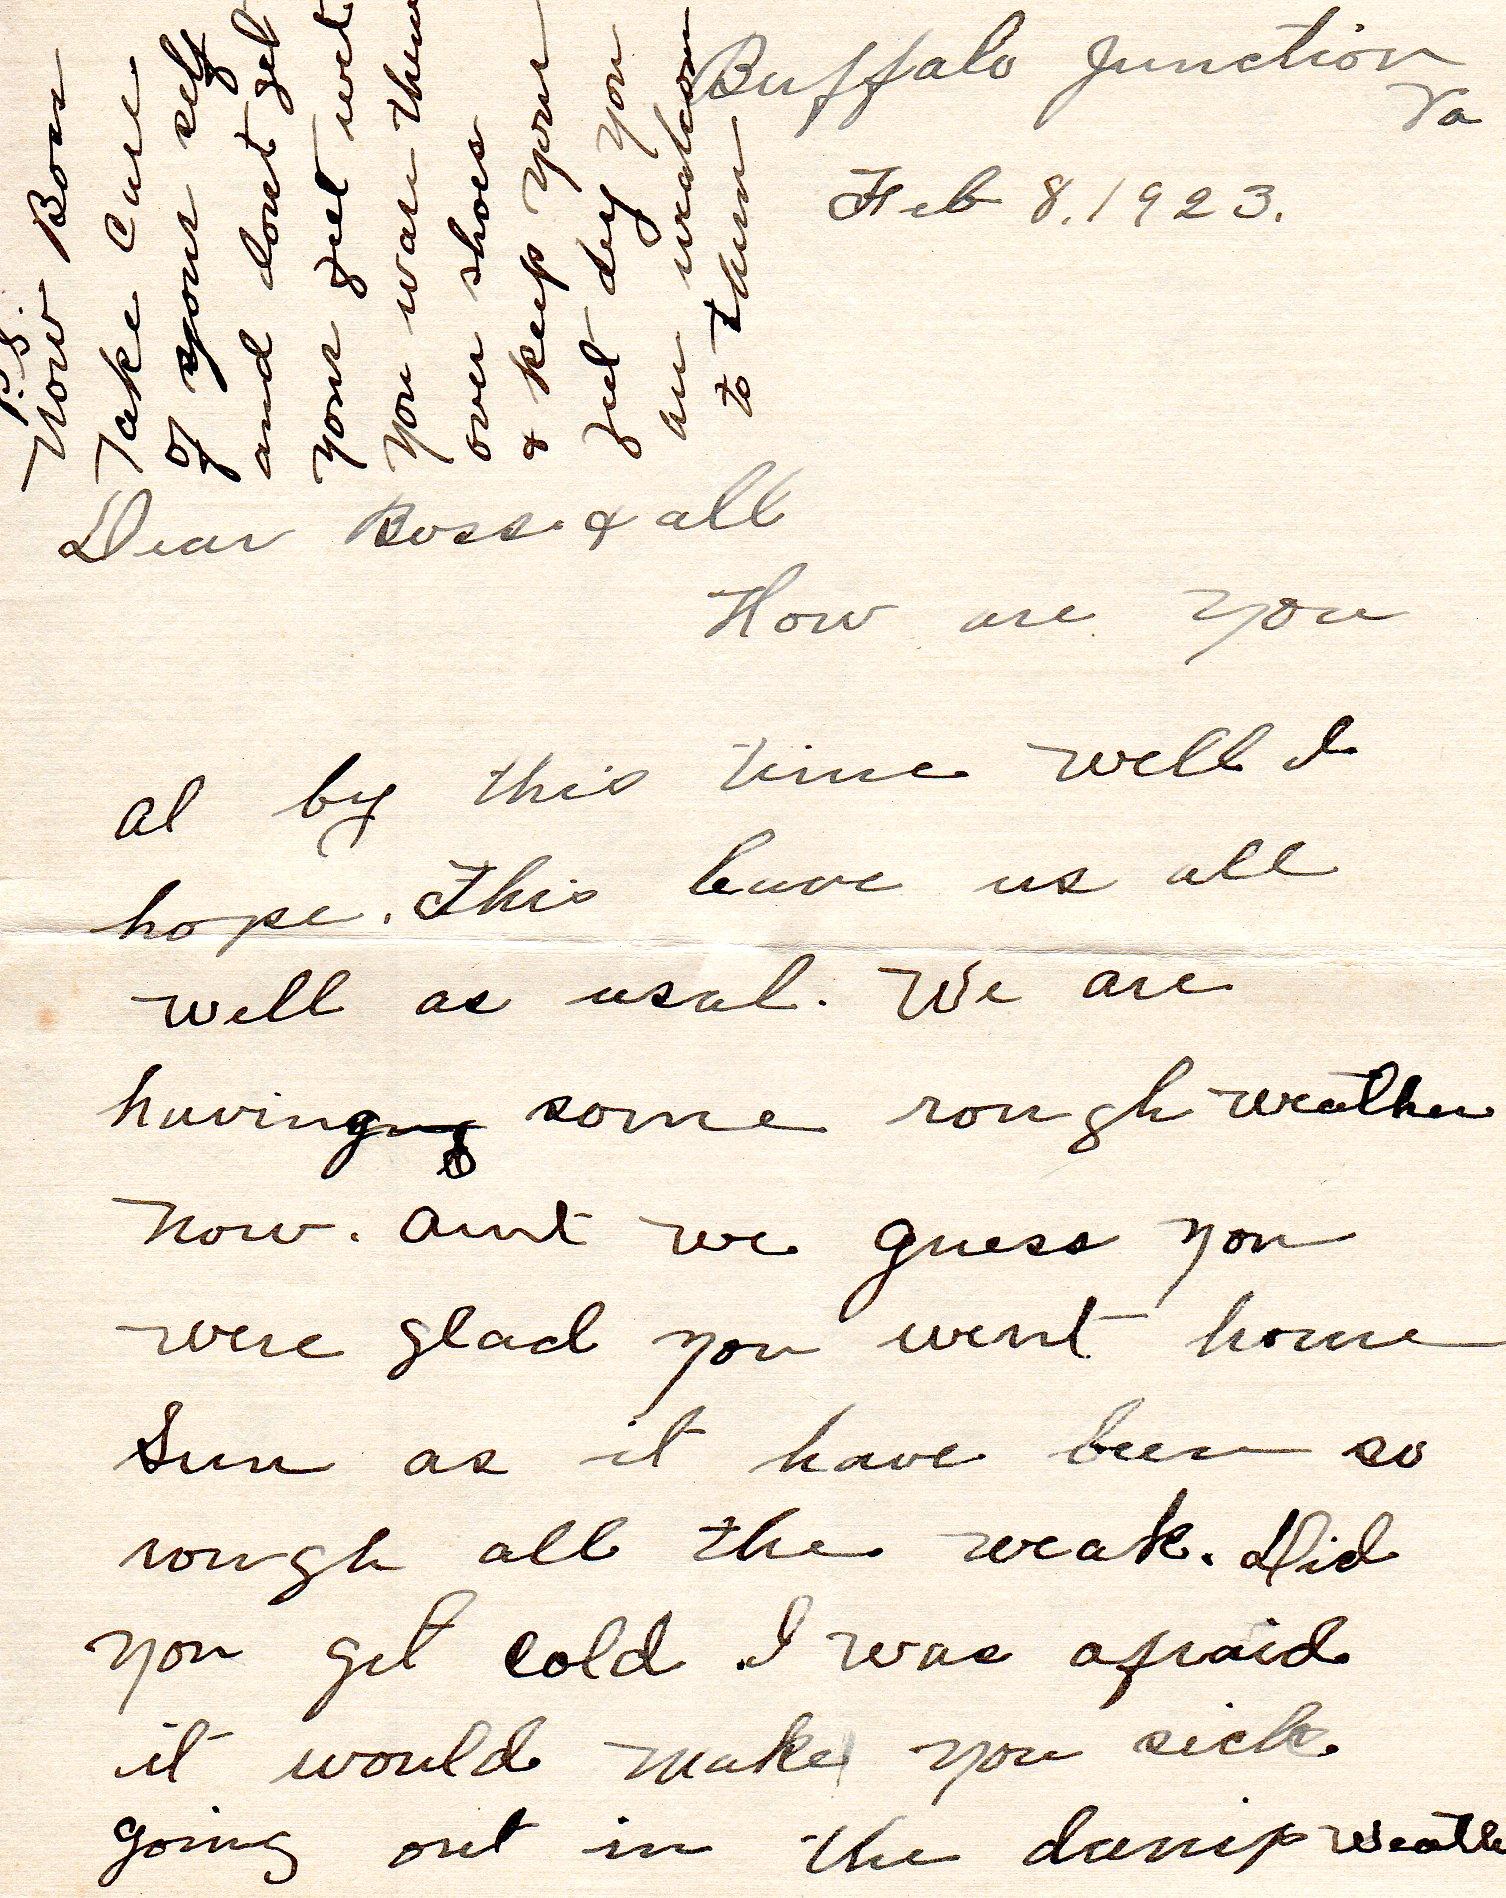 Best Tip to Decipher Your Ancestors' Handwriting